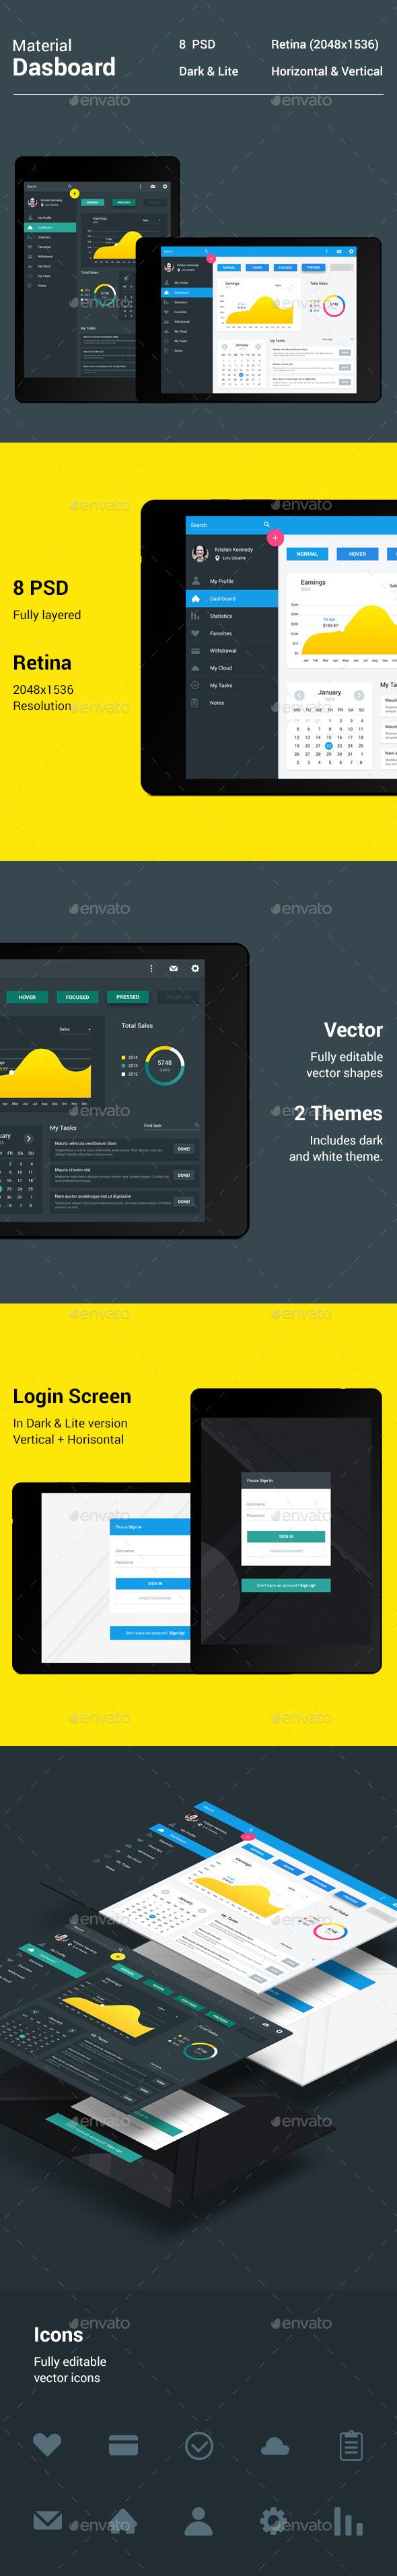 GraphicRiver Material Dashboard 10185038